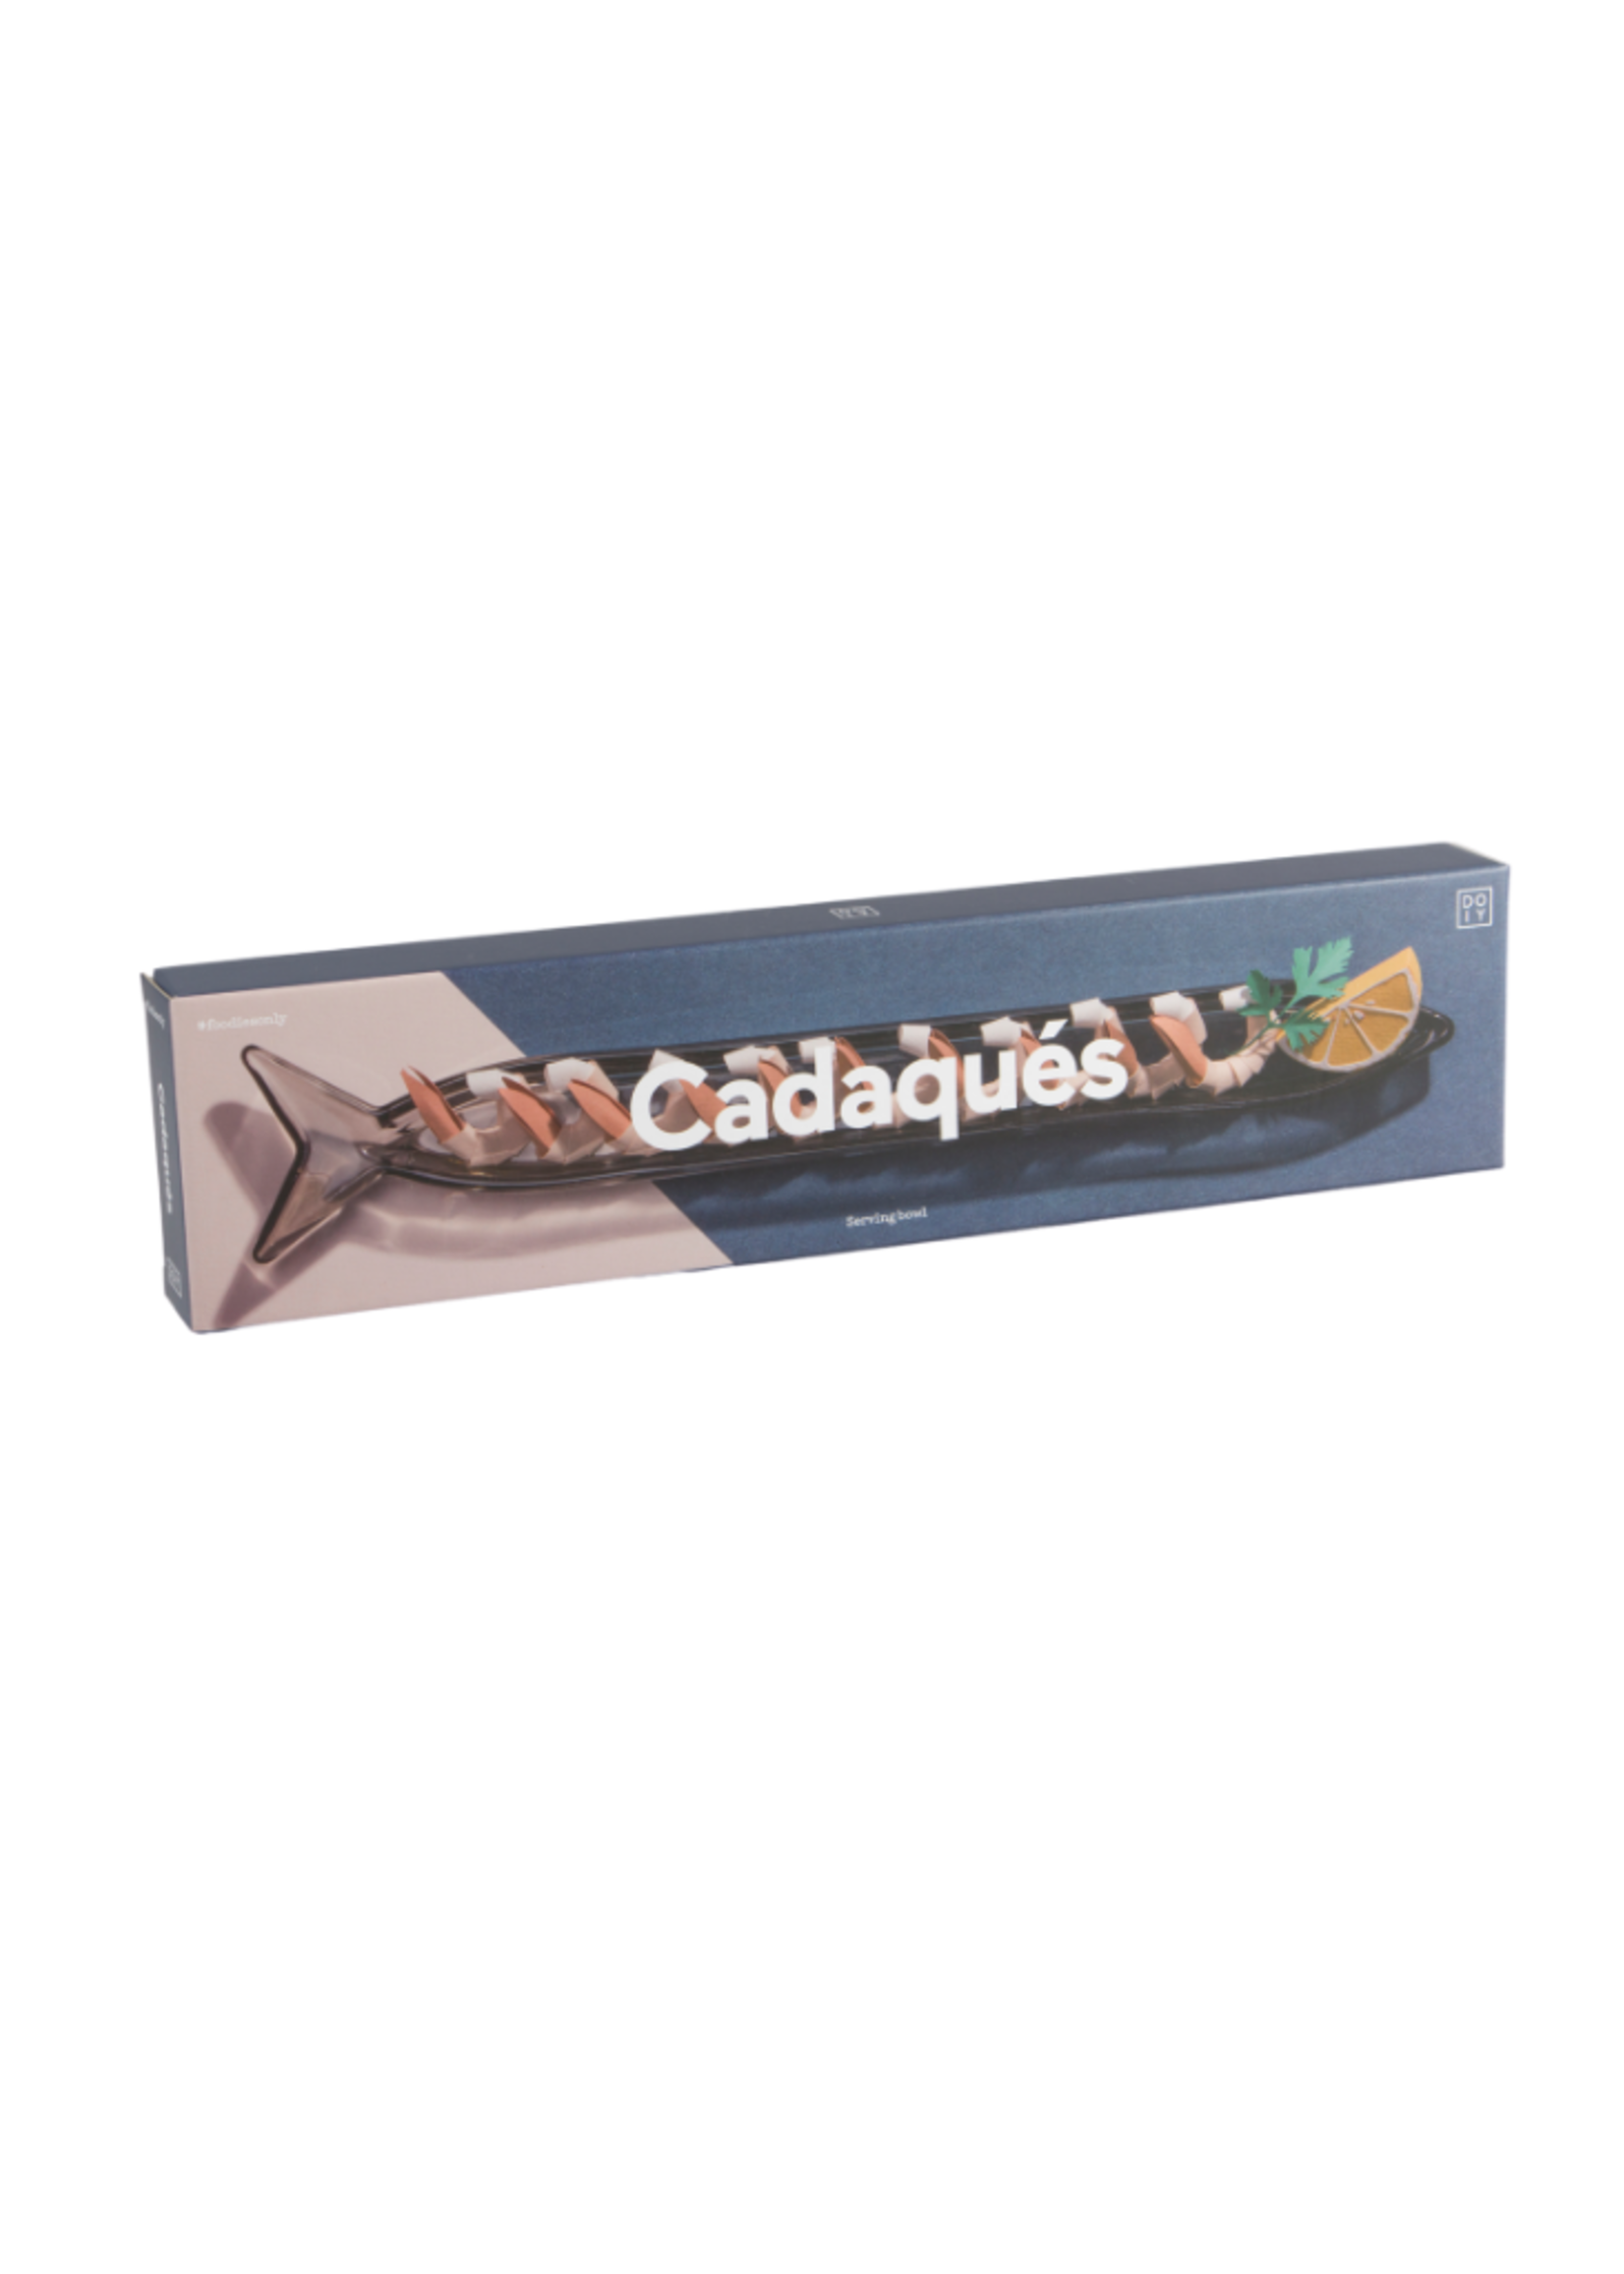 DOIY Cadaques Slate Serving Plate Large